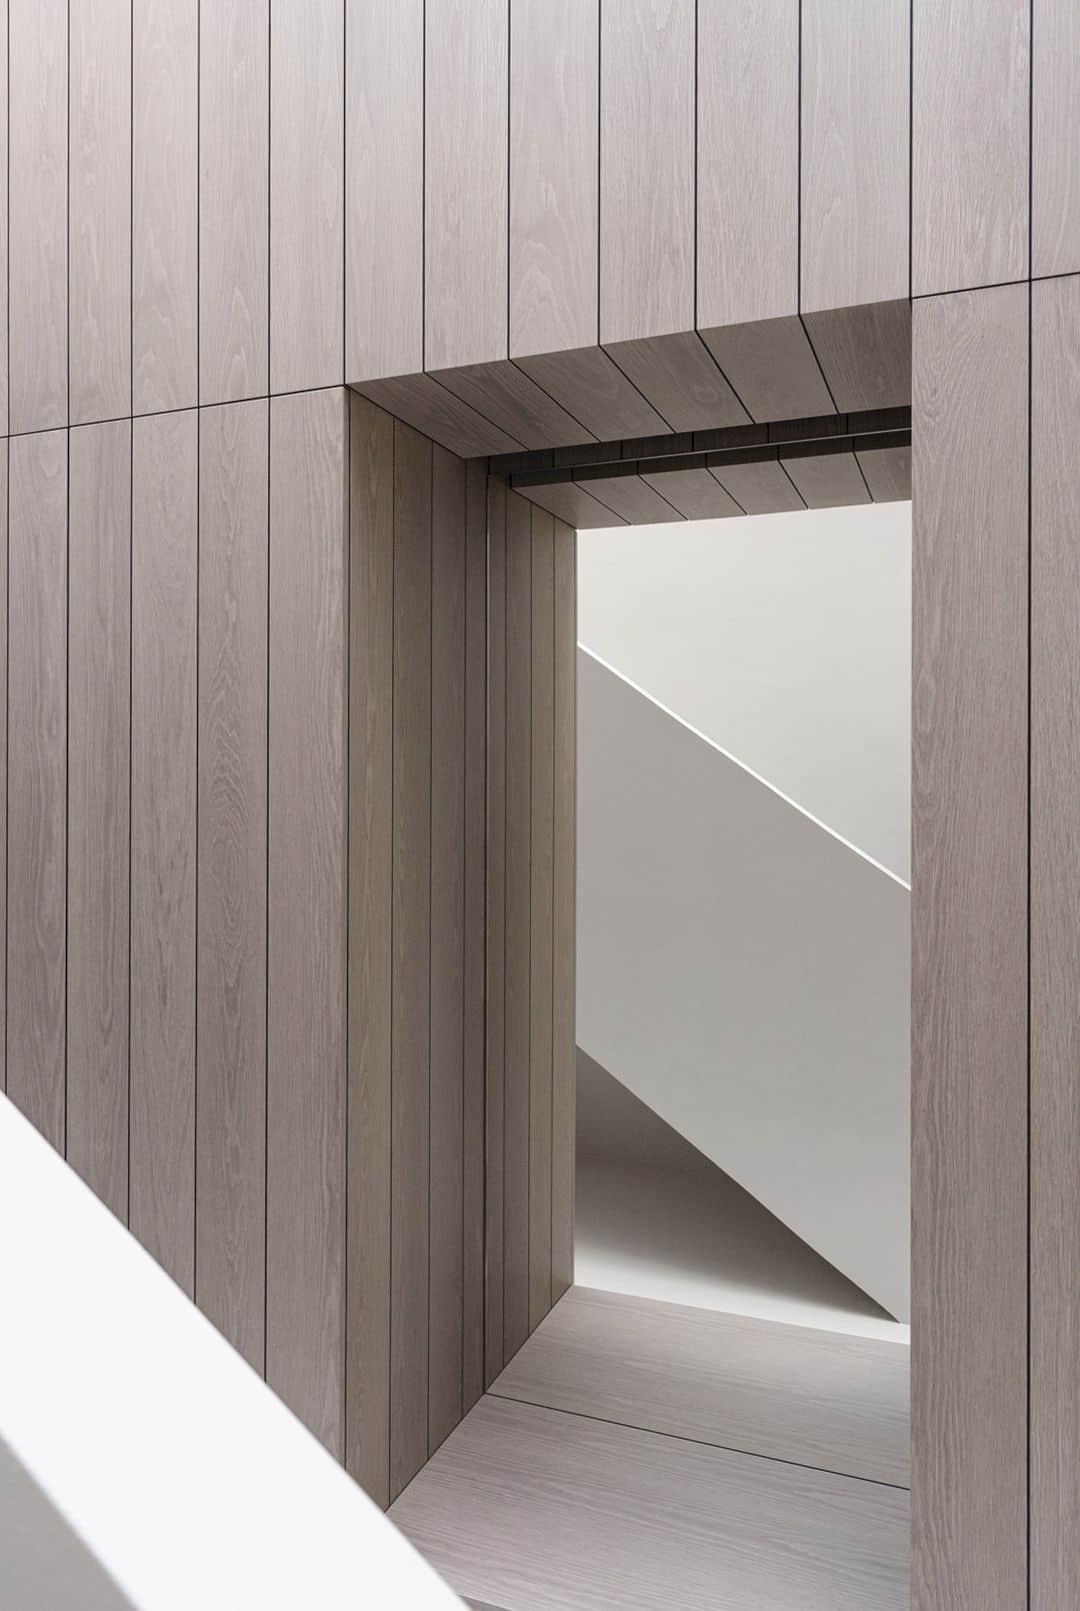 Matchbox Houses By Avanto Architects 3